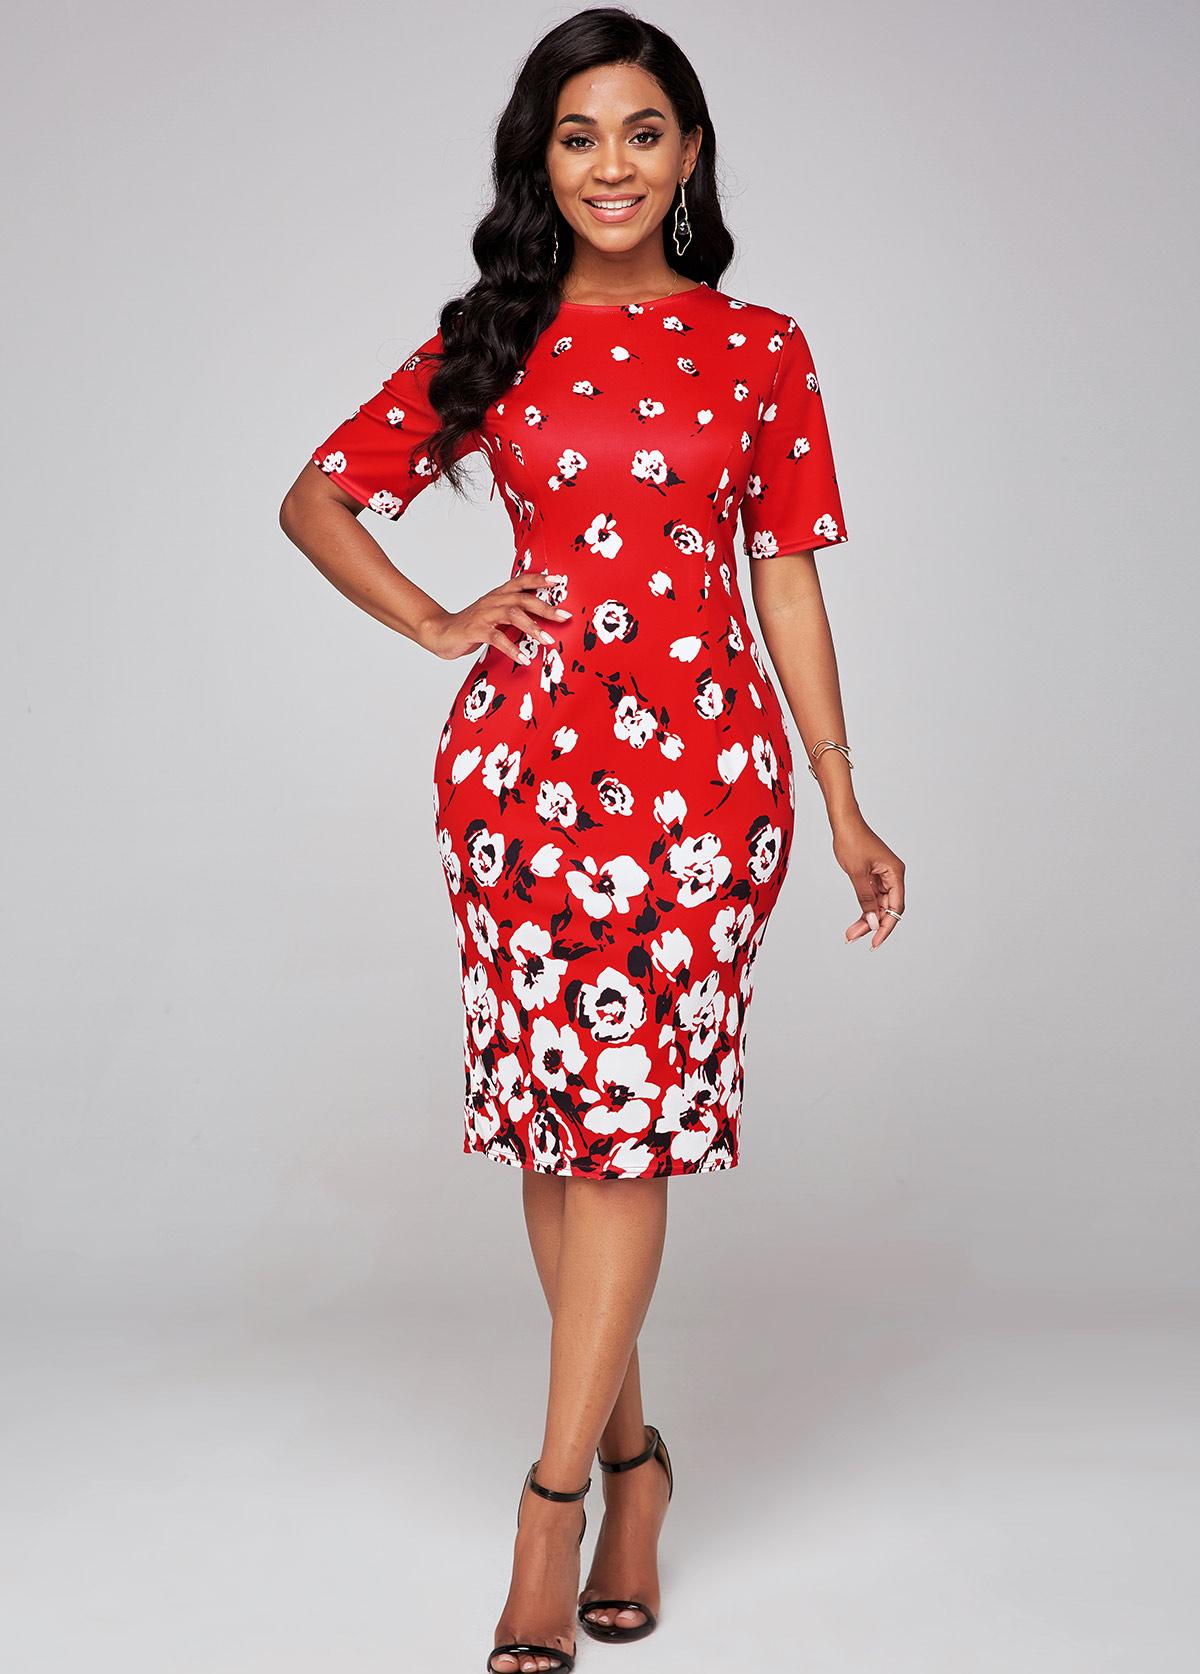 ROTITA Short Sleeve Floral Print Round Neck Bodycon Dress